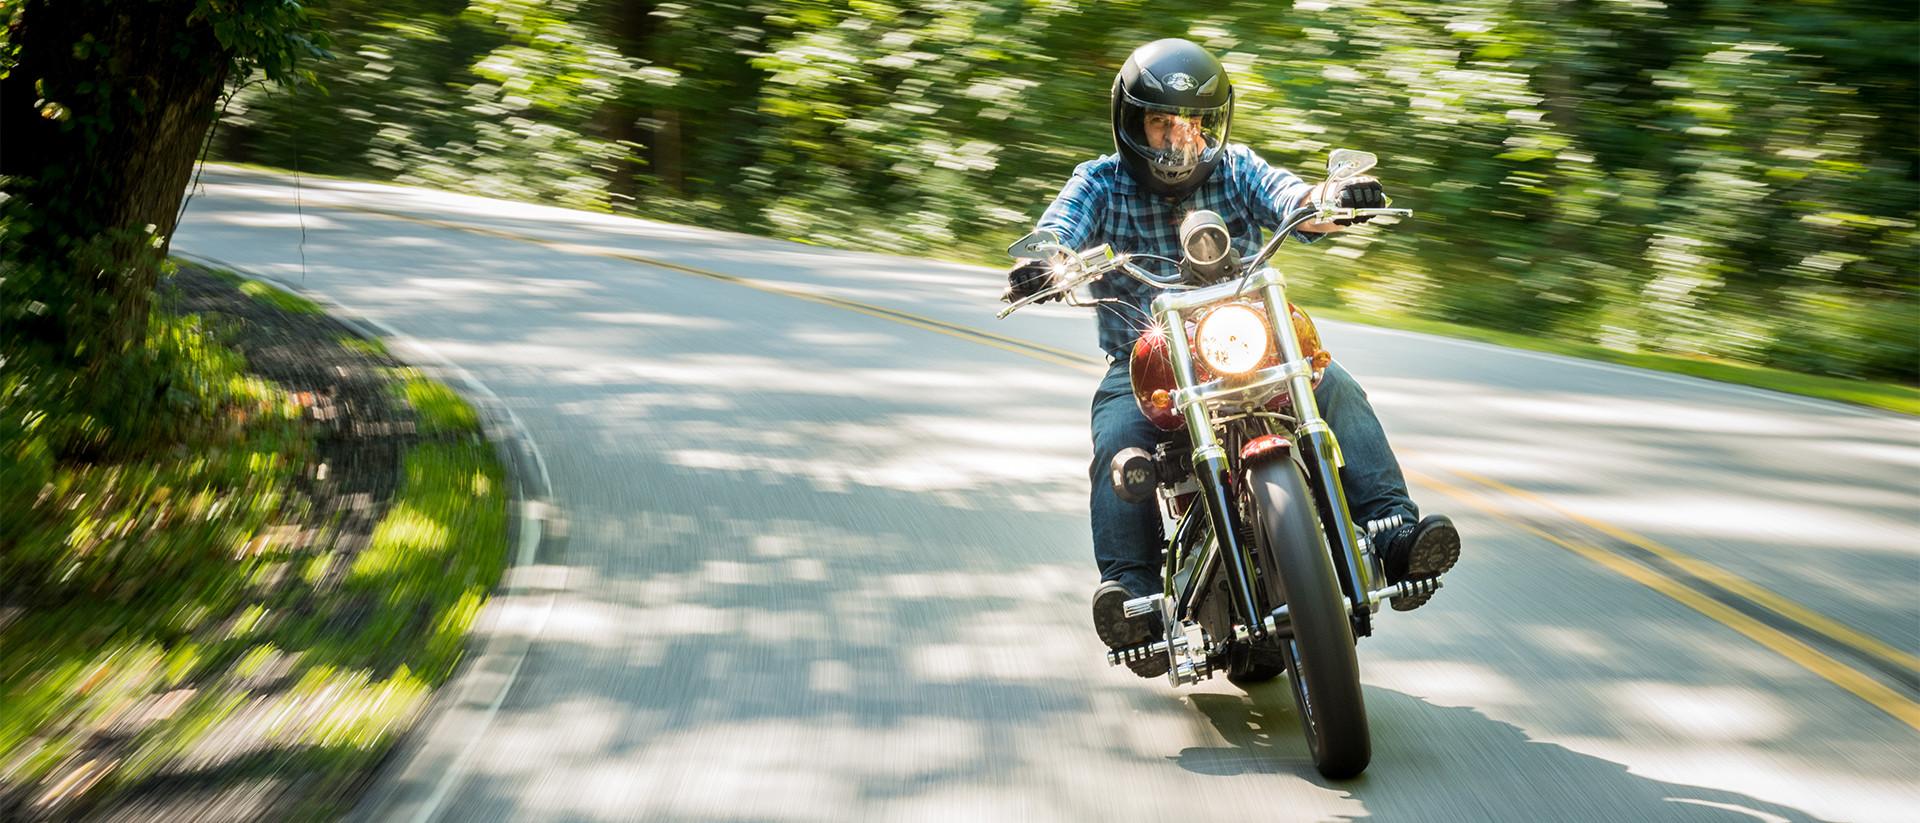 SuperTrapp Motorcycle